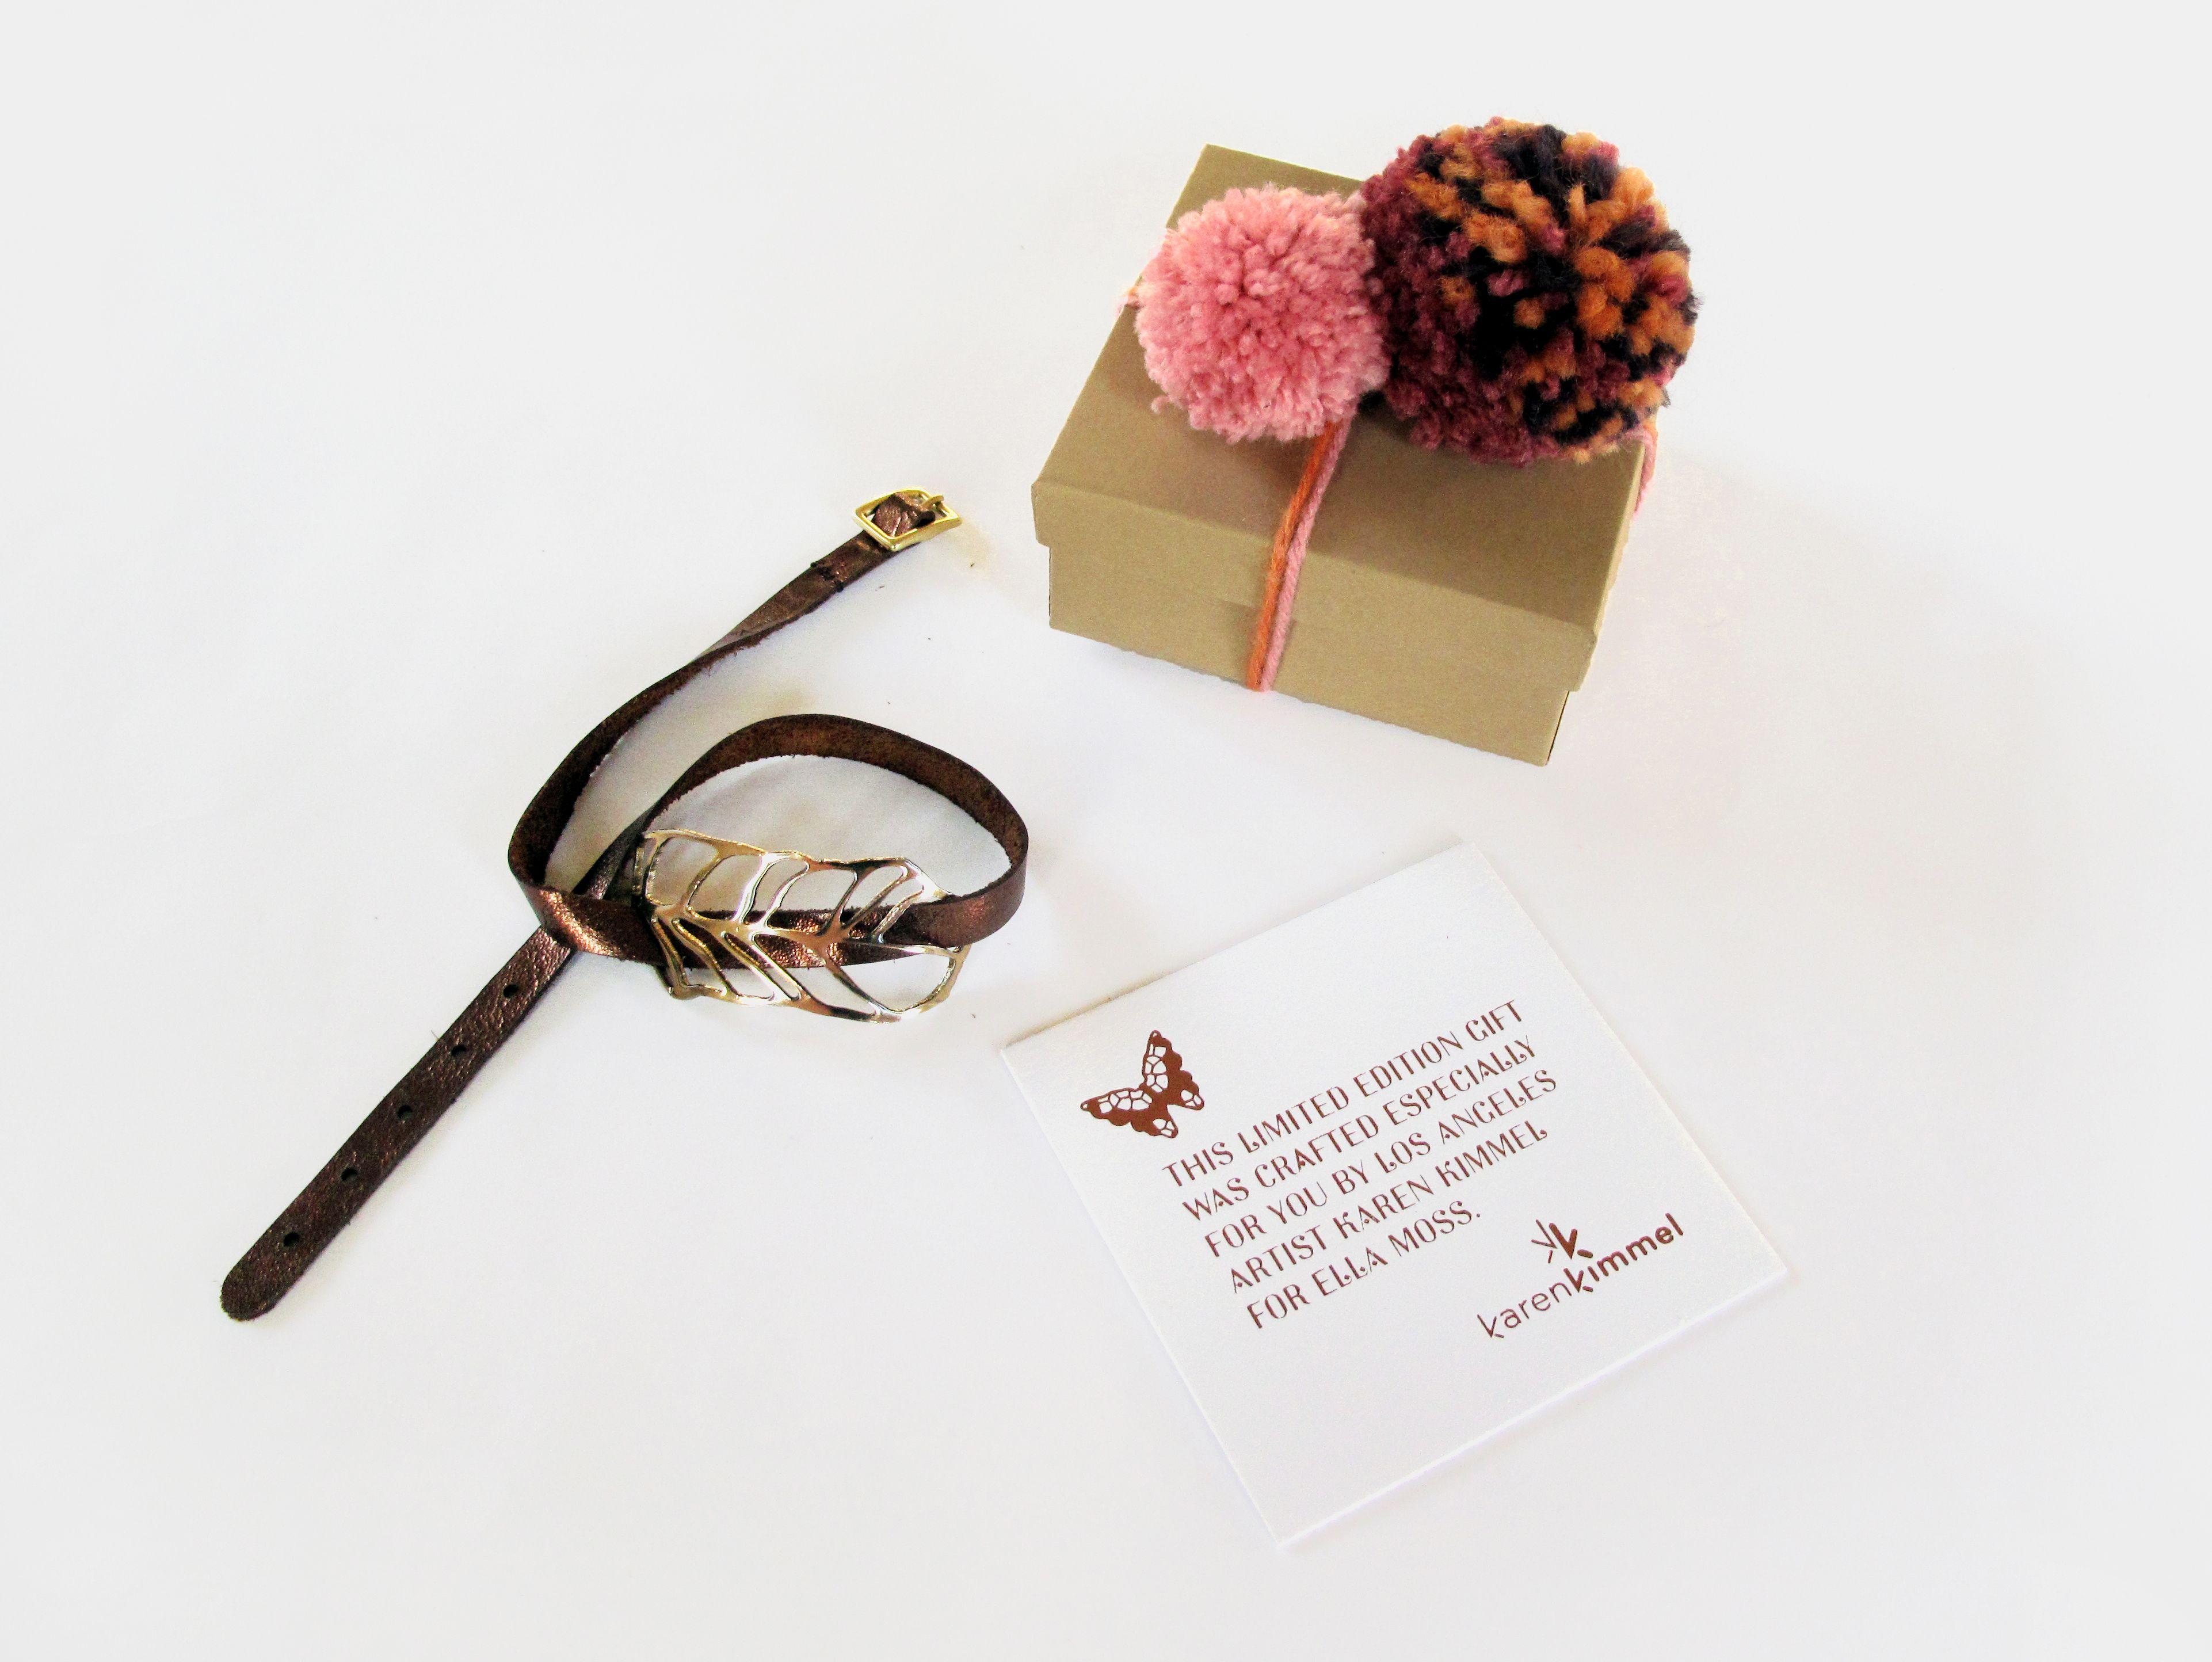 Limited edition bracelet by Karen Kimmel Studios for Ella Moss